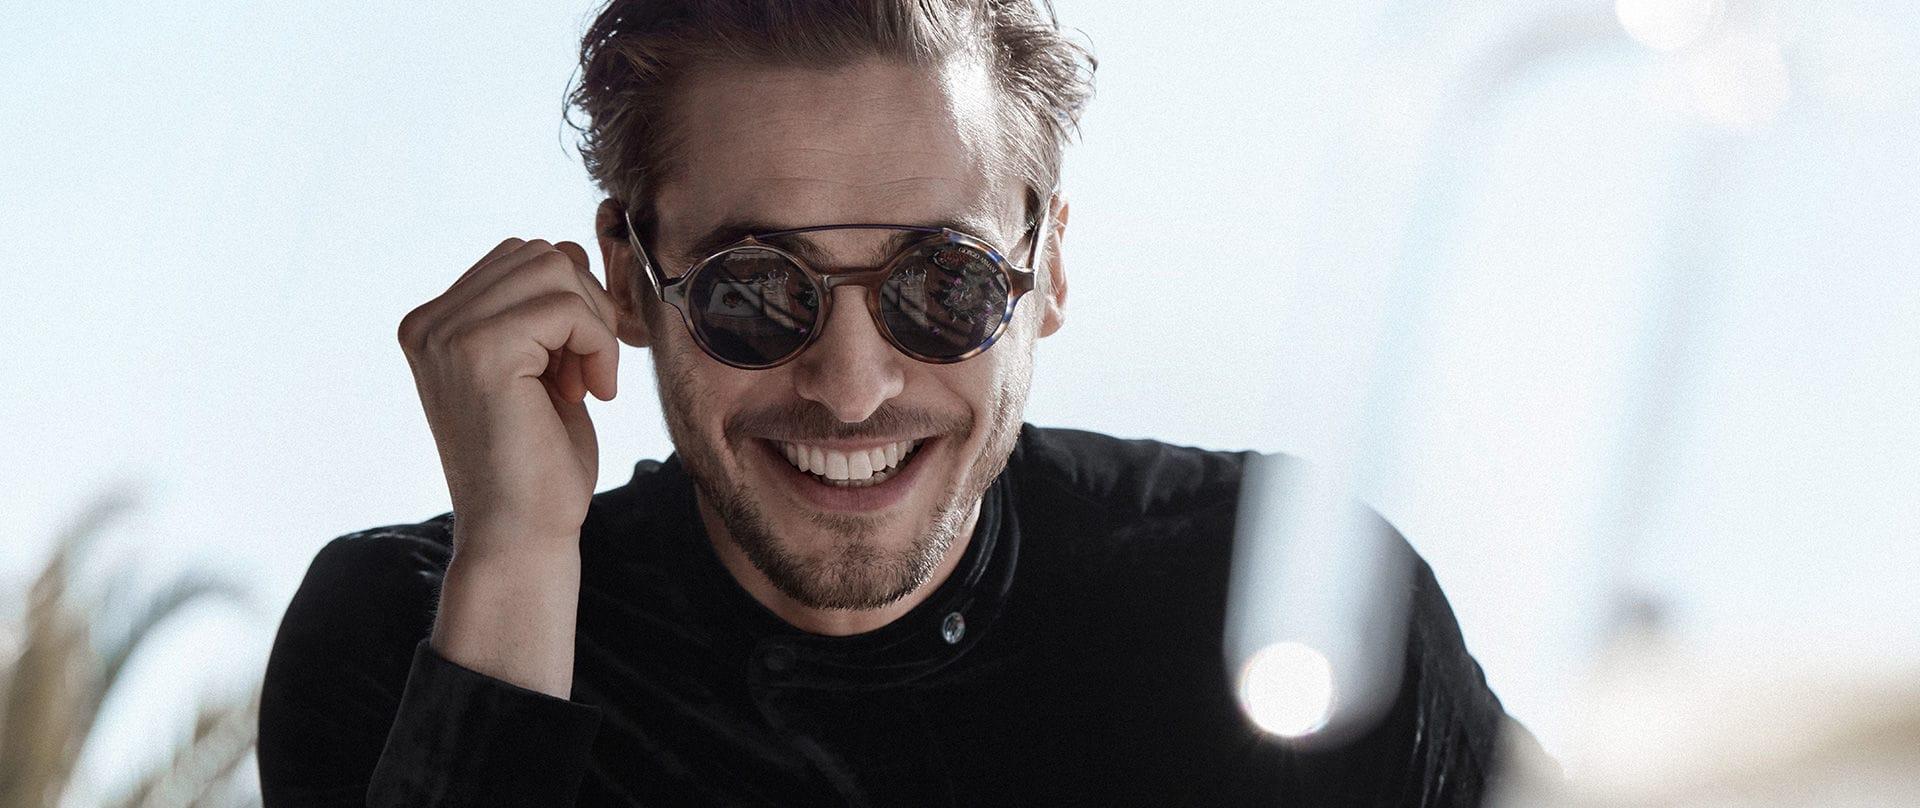 Giorgio_Armani_Eyewear_FW18_Santa_Ibiza_10.jpg